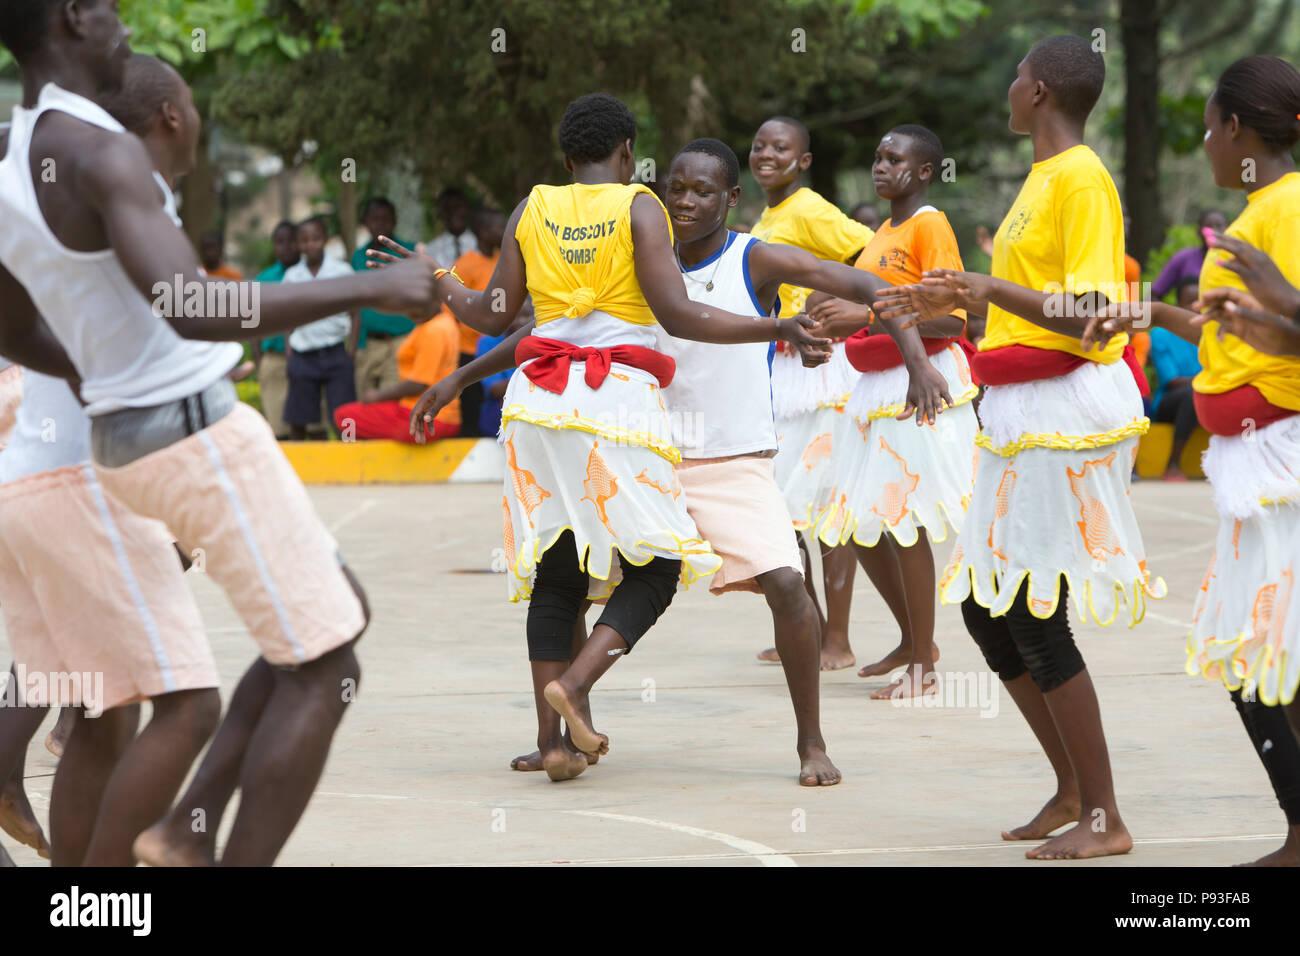 Bombo, Uganda - Students of the Don Bosco Vocational Training Center Bombo perform a dance. - Stock Image